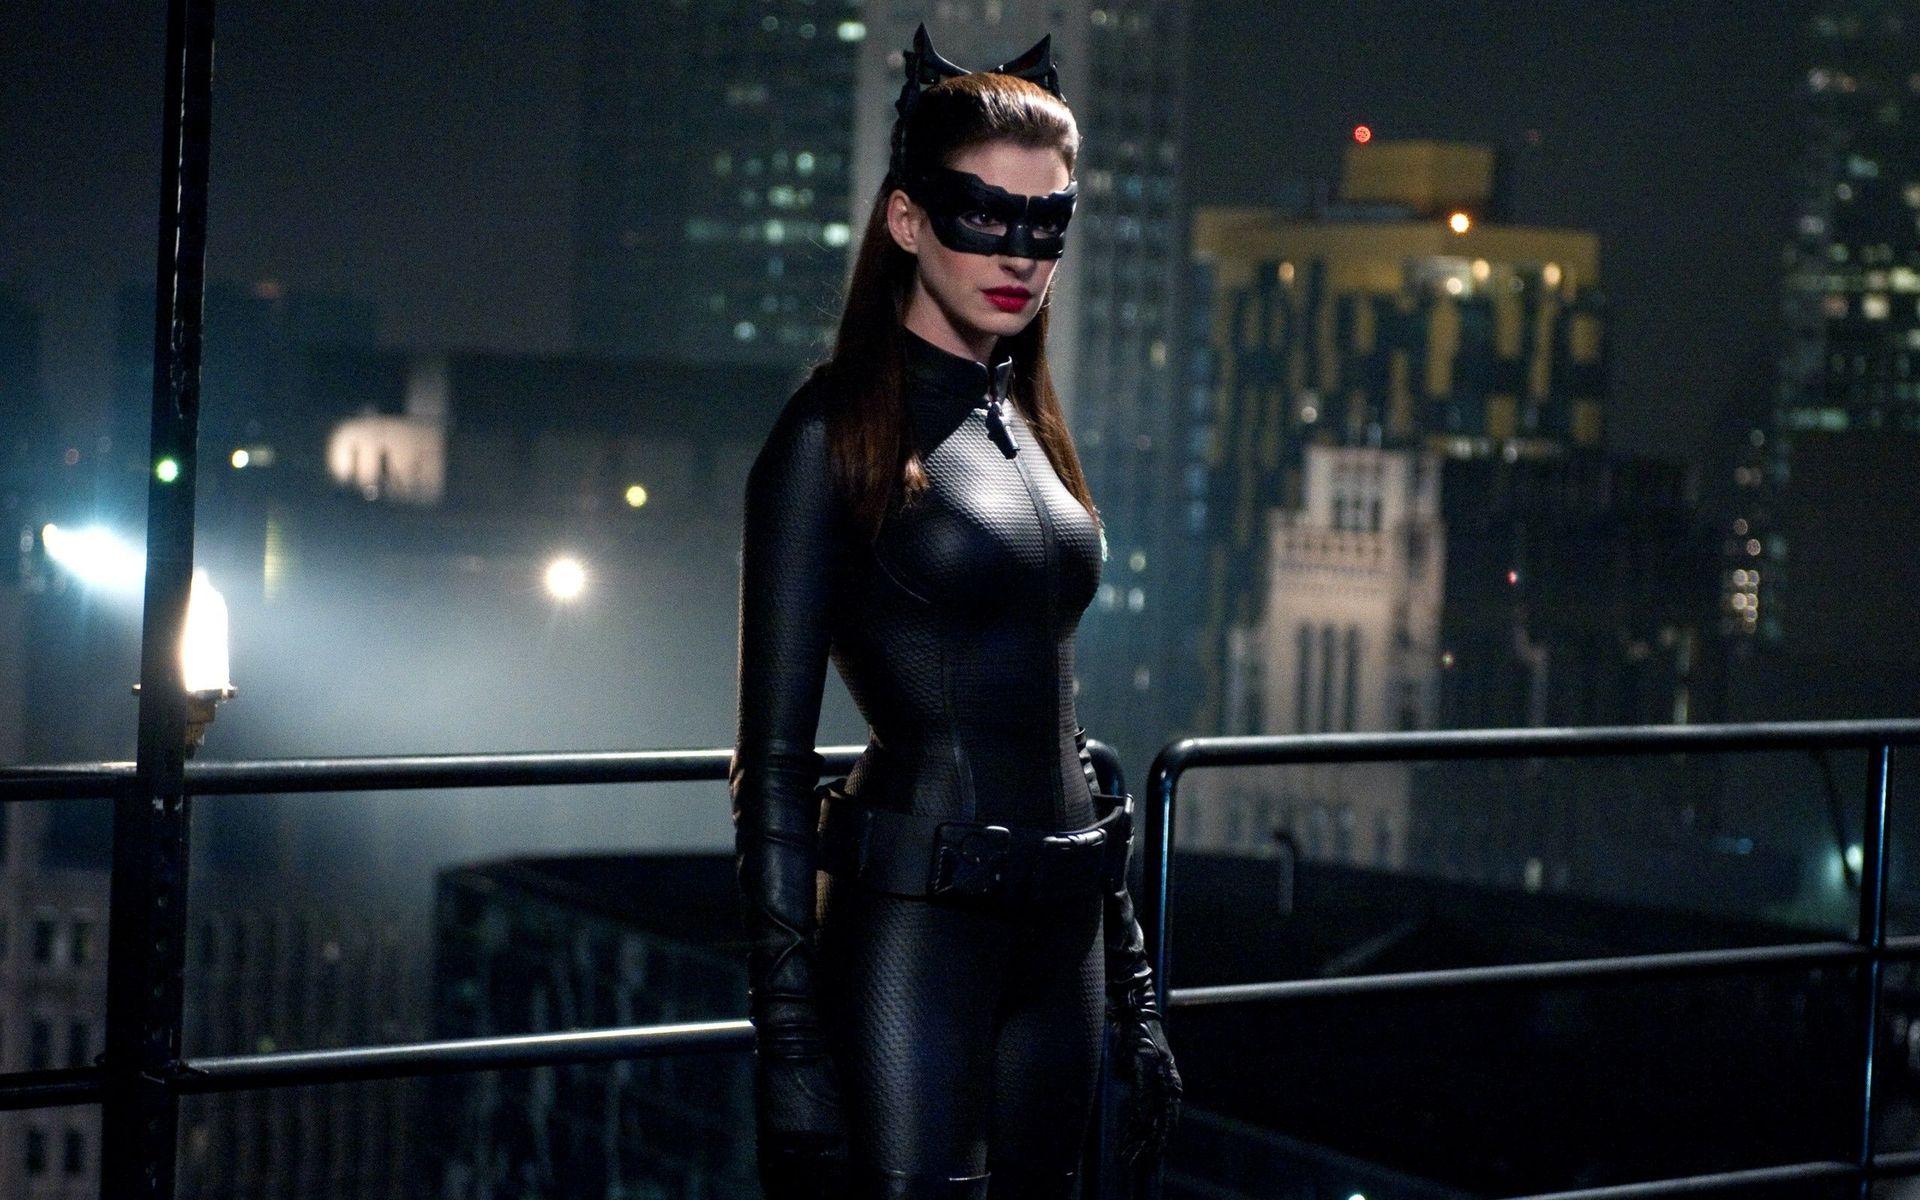 catwoman-the-dark-knight-rises-movie-hd-